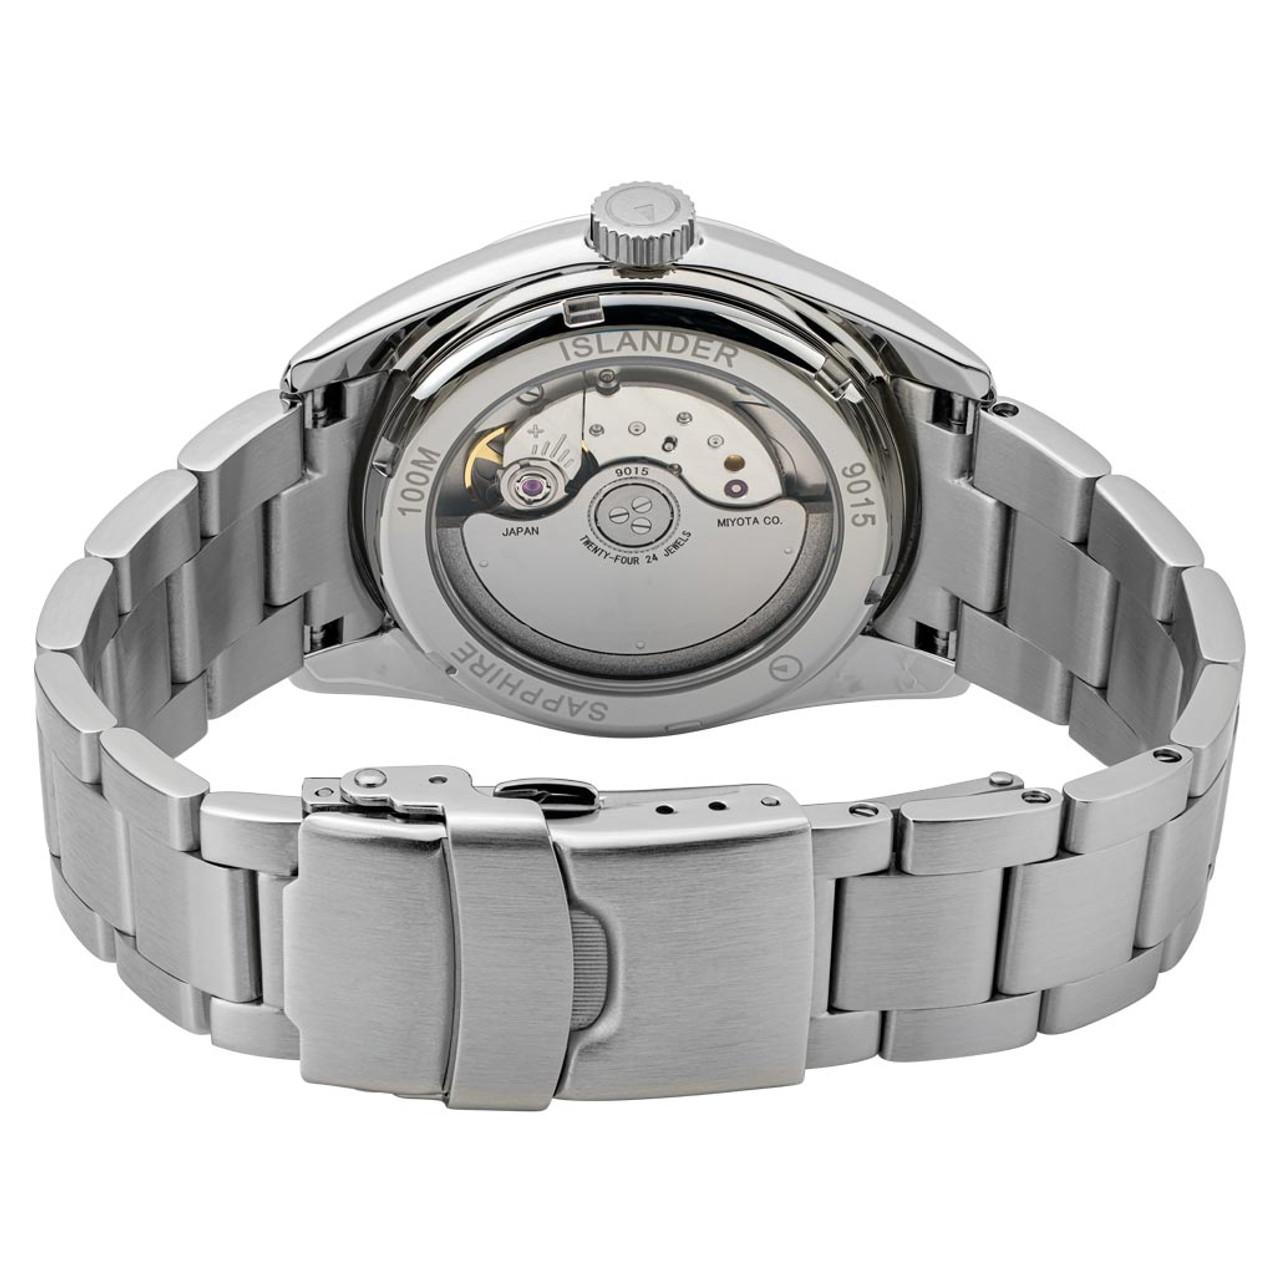 islander-automatic-mens-dress-watch-isl-85-7__65267.1626507990.jpg